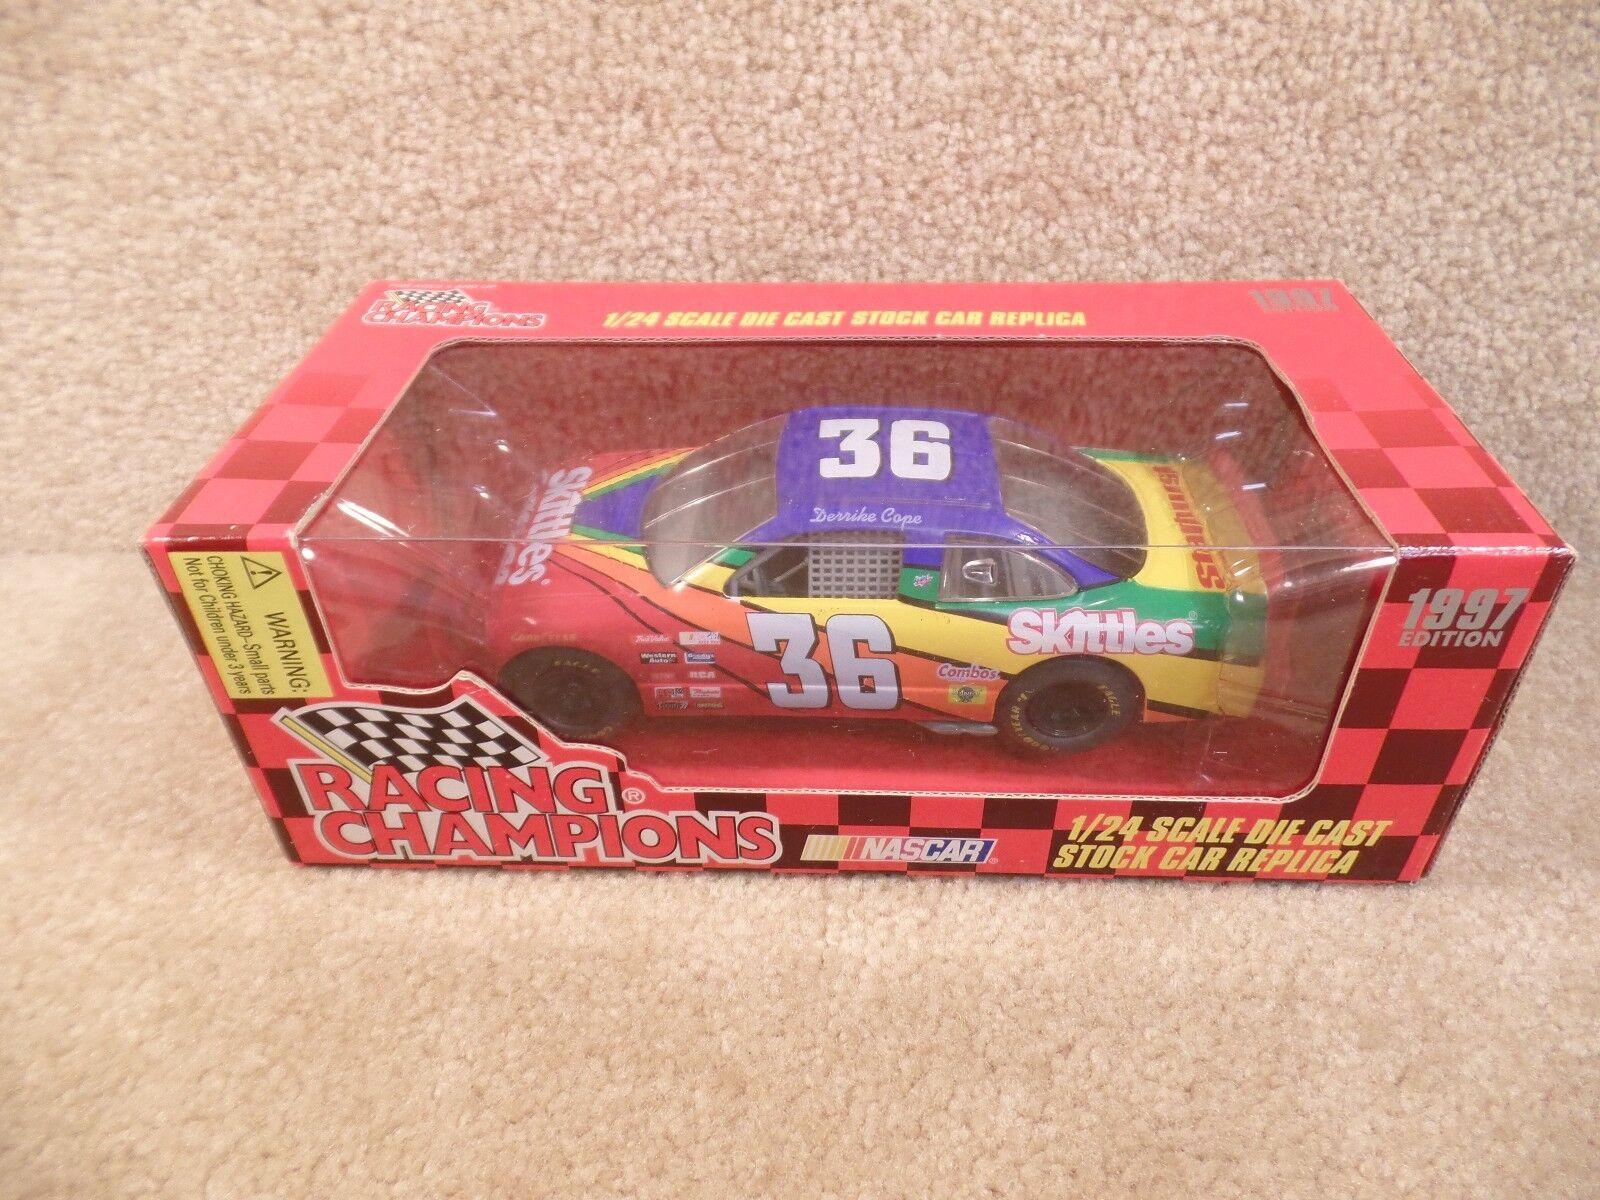 New 1997 Racing Champions 1 24 NASCAR Derrike Cope Skittles Pontiac Grand Prix